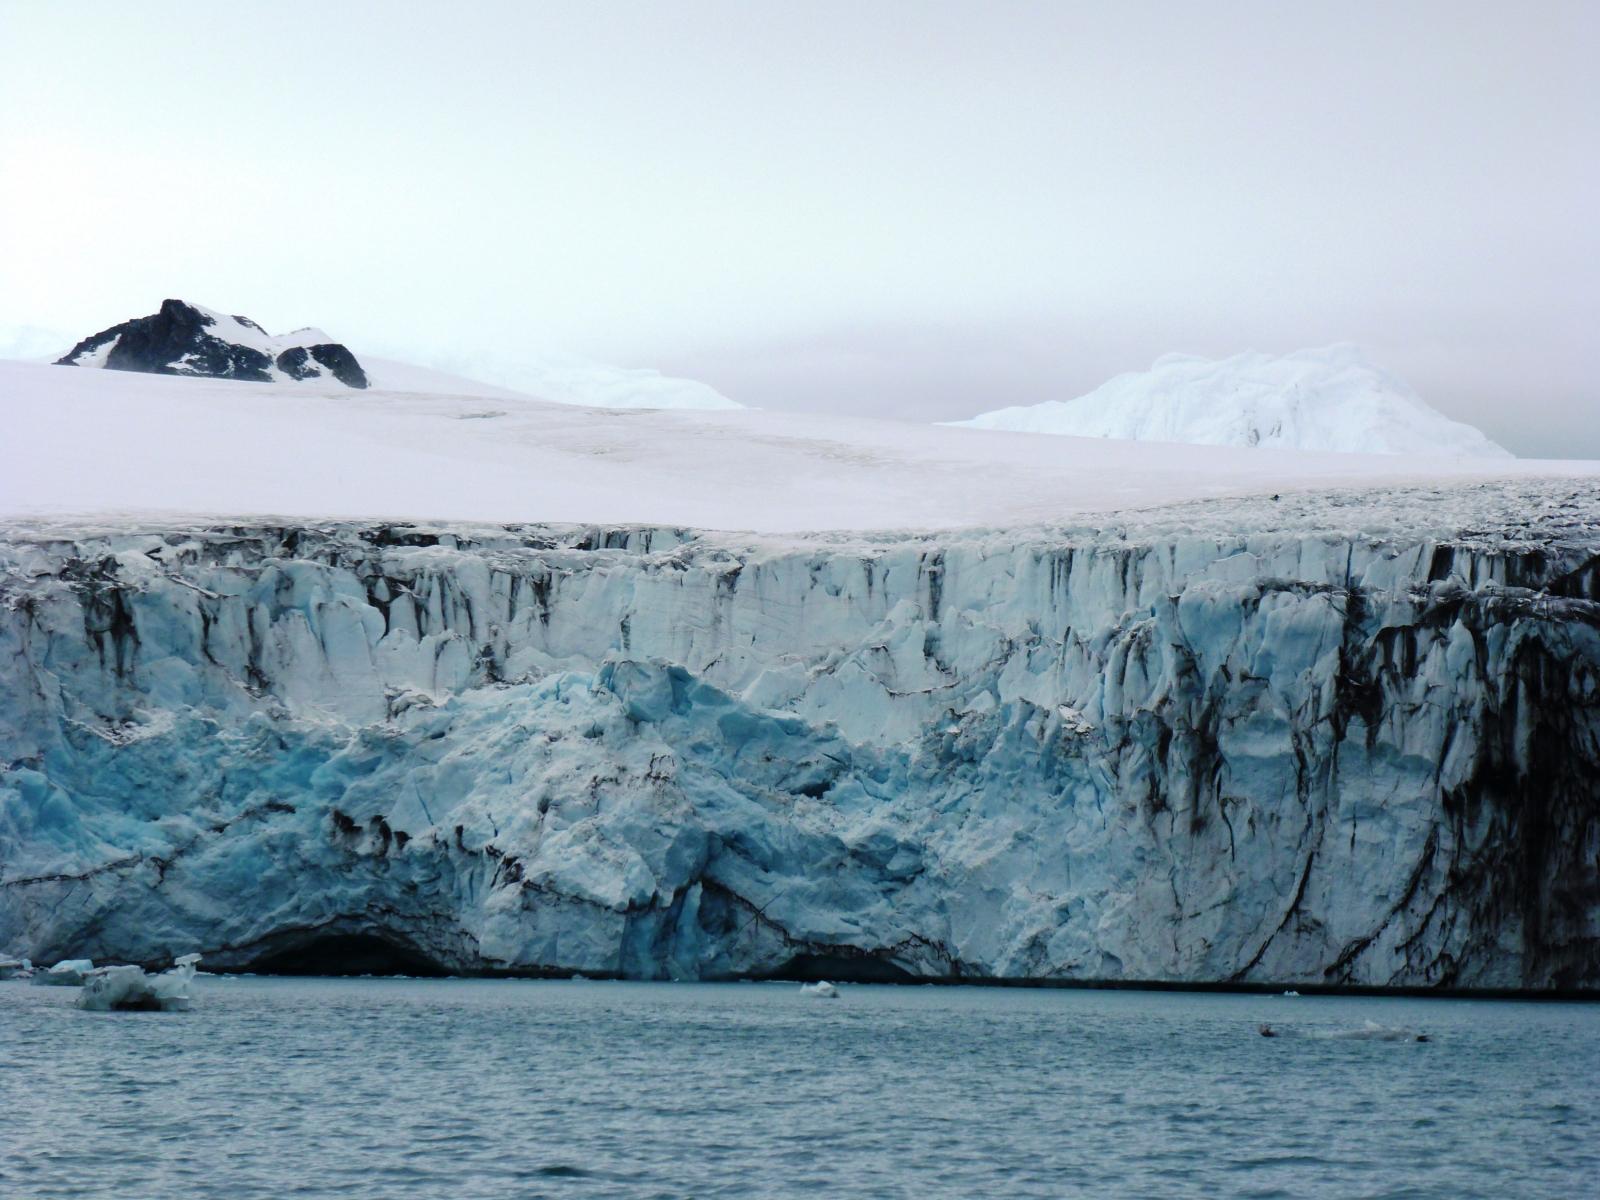 Revolutionary Nasa technique captures melting Antarctic ice like never before